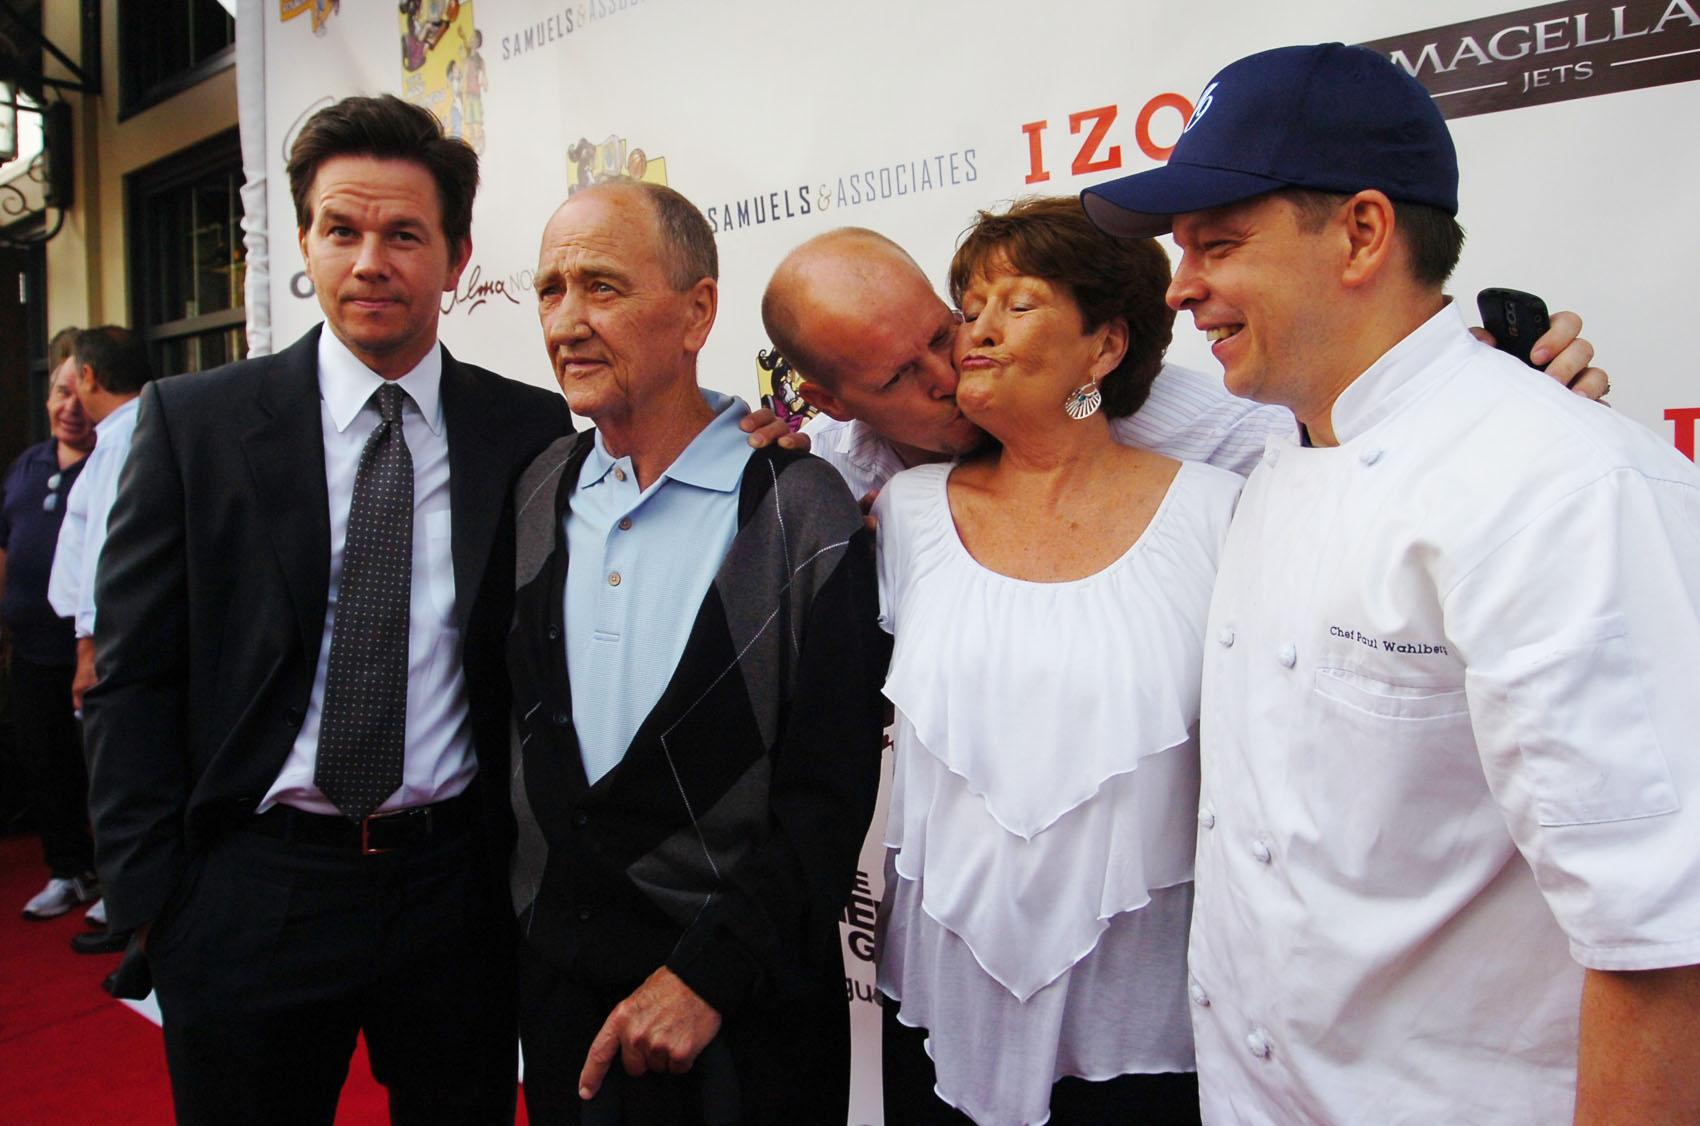 Paul Wahlberg Family Elizabeth vargas substance